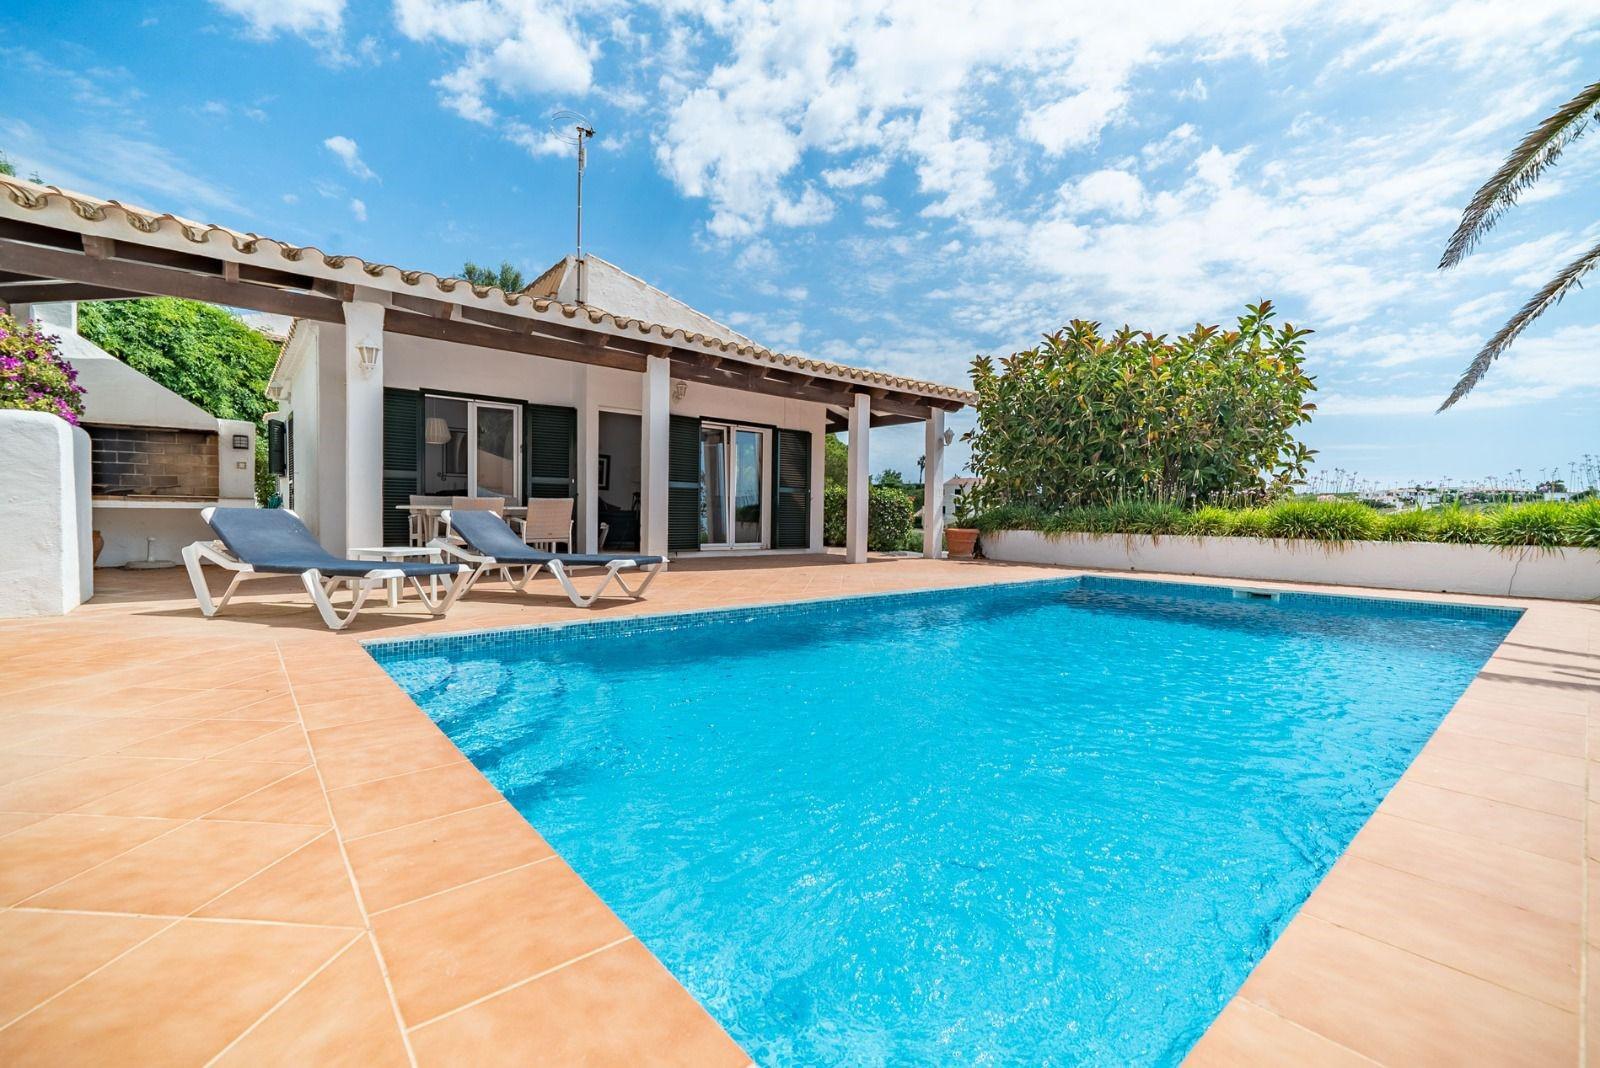 Cheap Villas to rent in Menorca